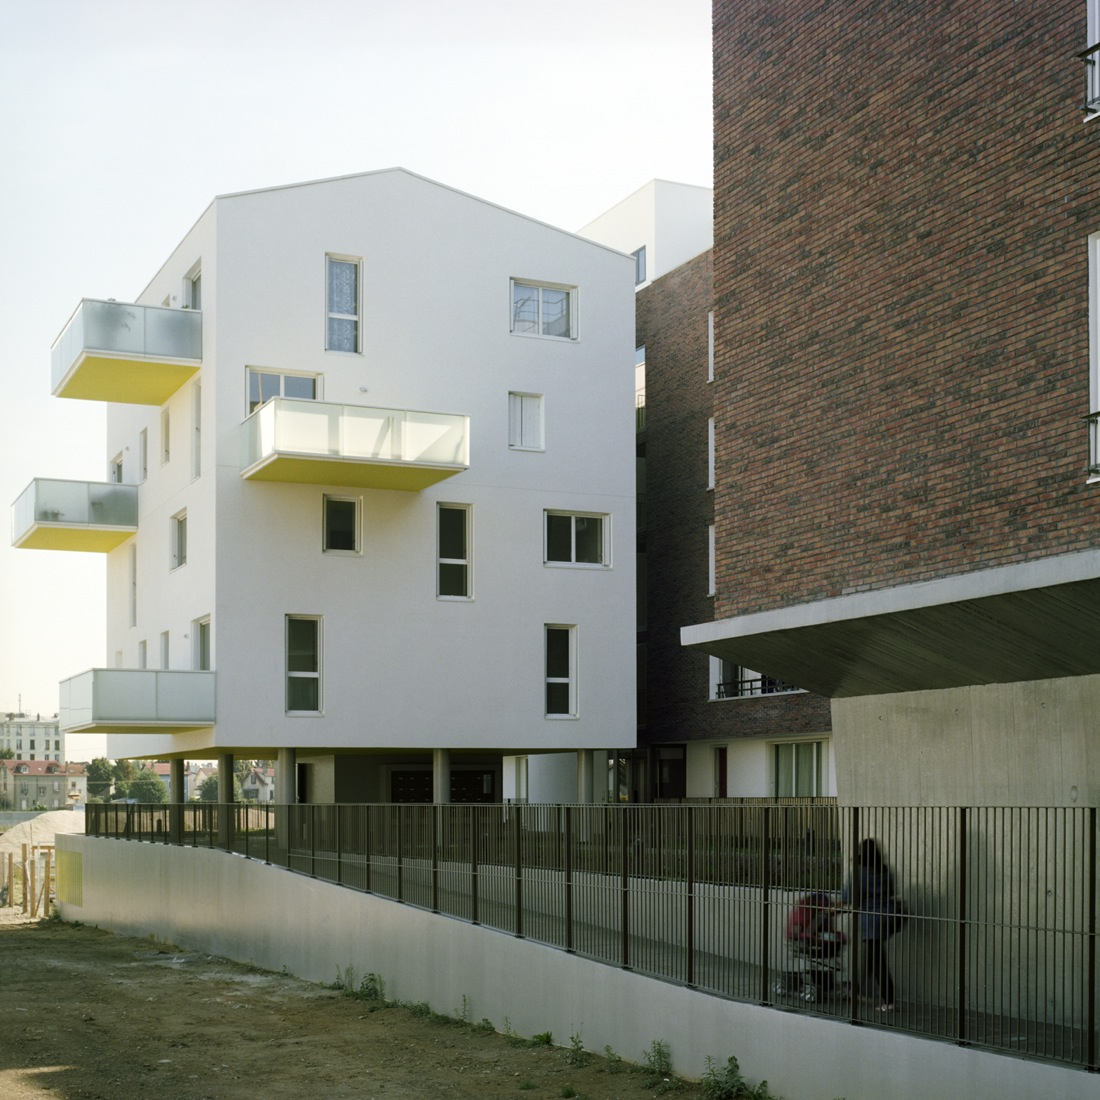 Choisy le Roi Housing / Olivier Sinet + Benjamin Fleury , © Emmanuelle Blanc